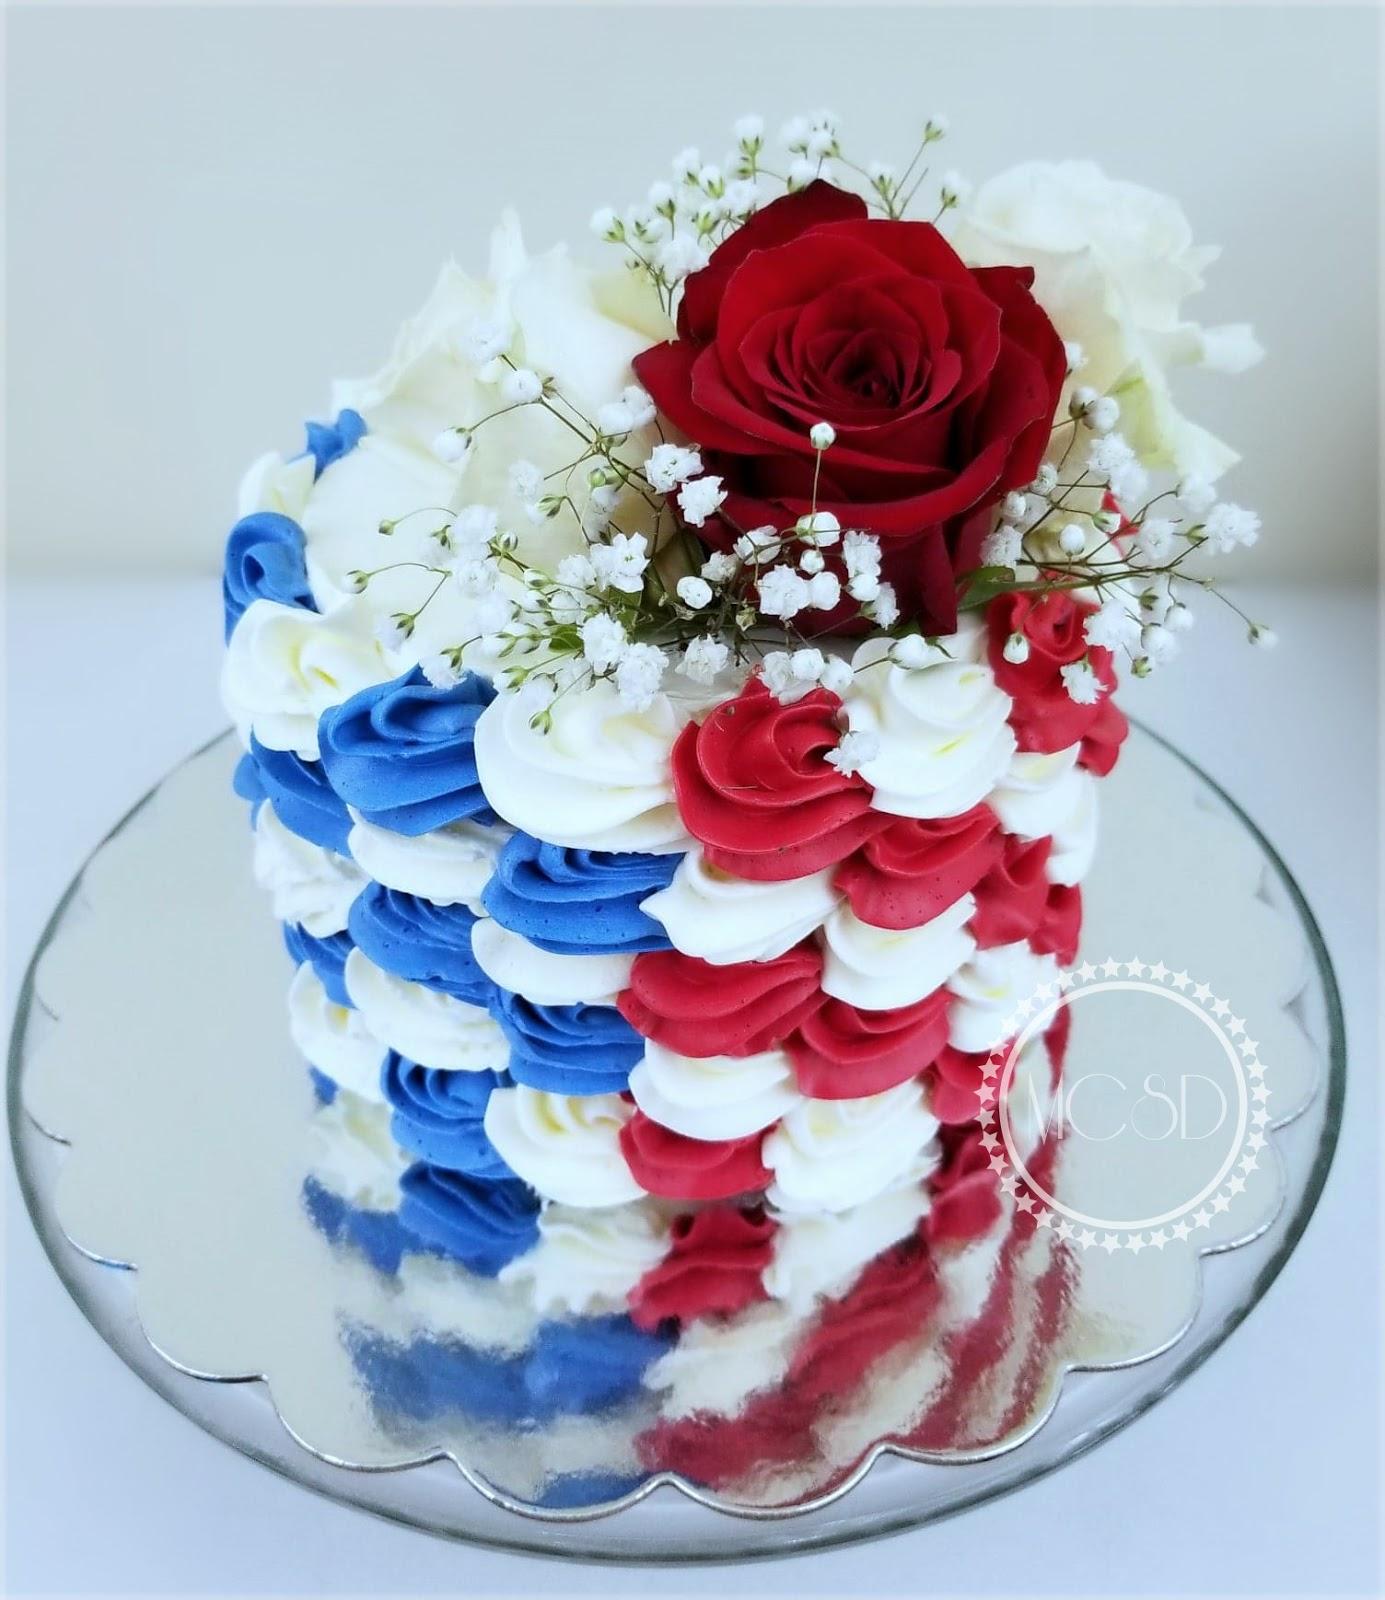 My Cake Sweet Dreams 4th Of July Birthday Cake